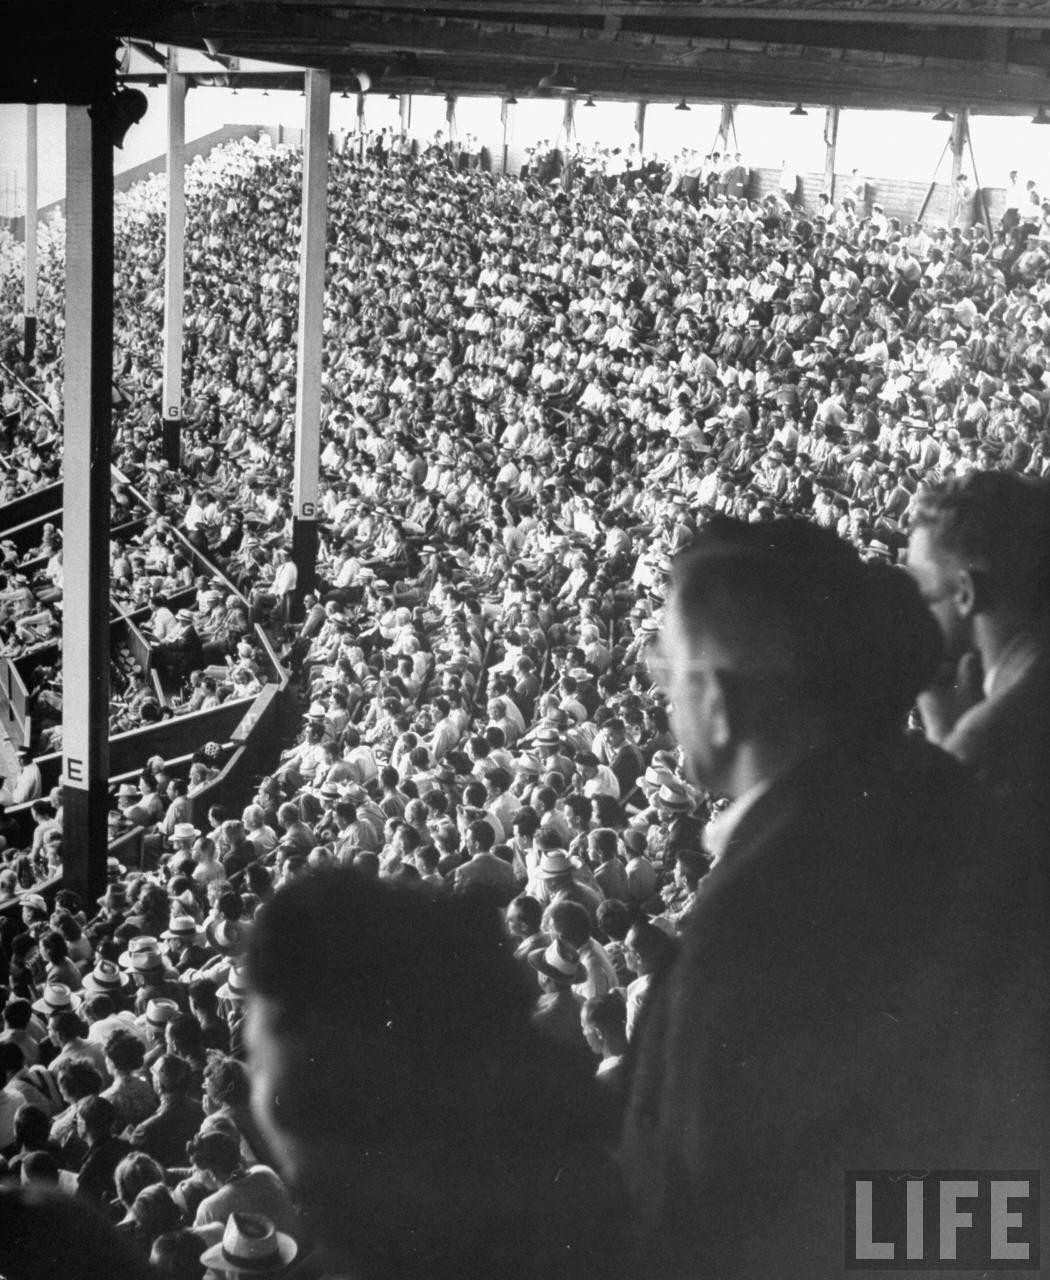 Baseball crowd from Life Magazine